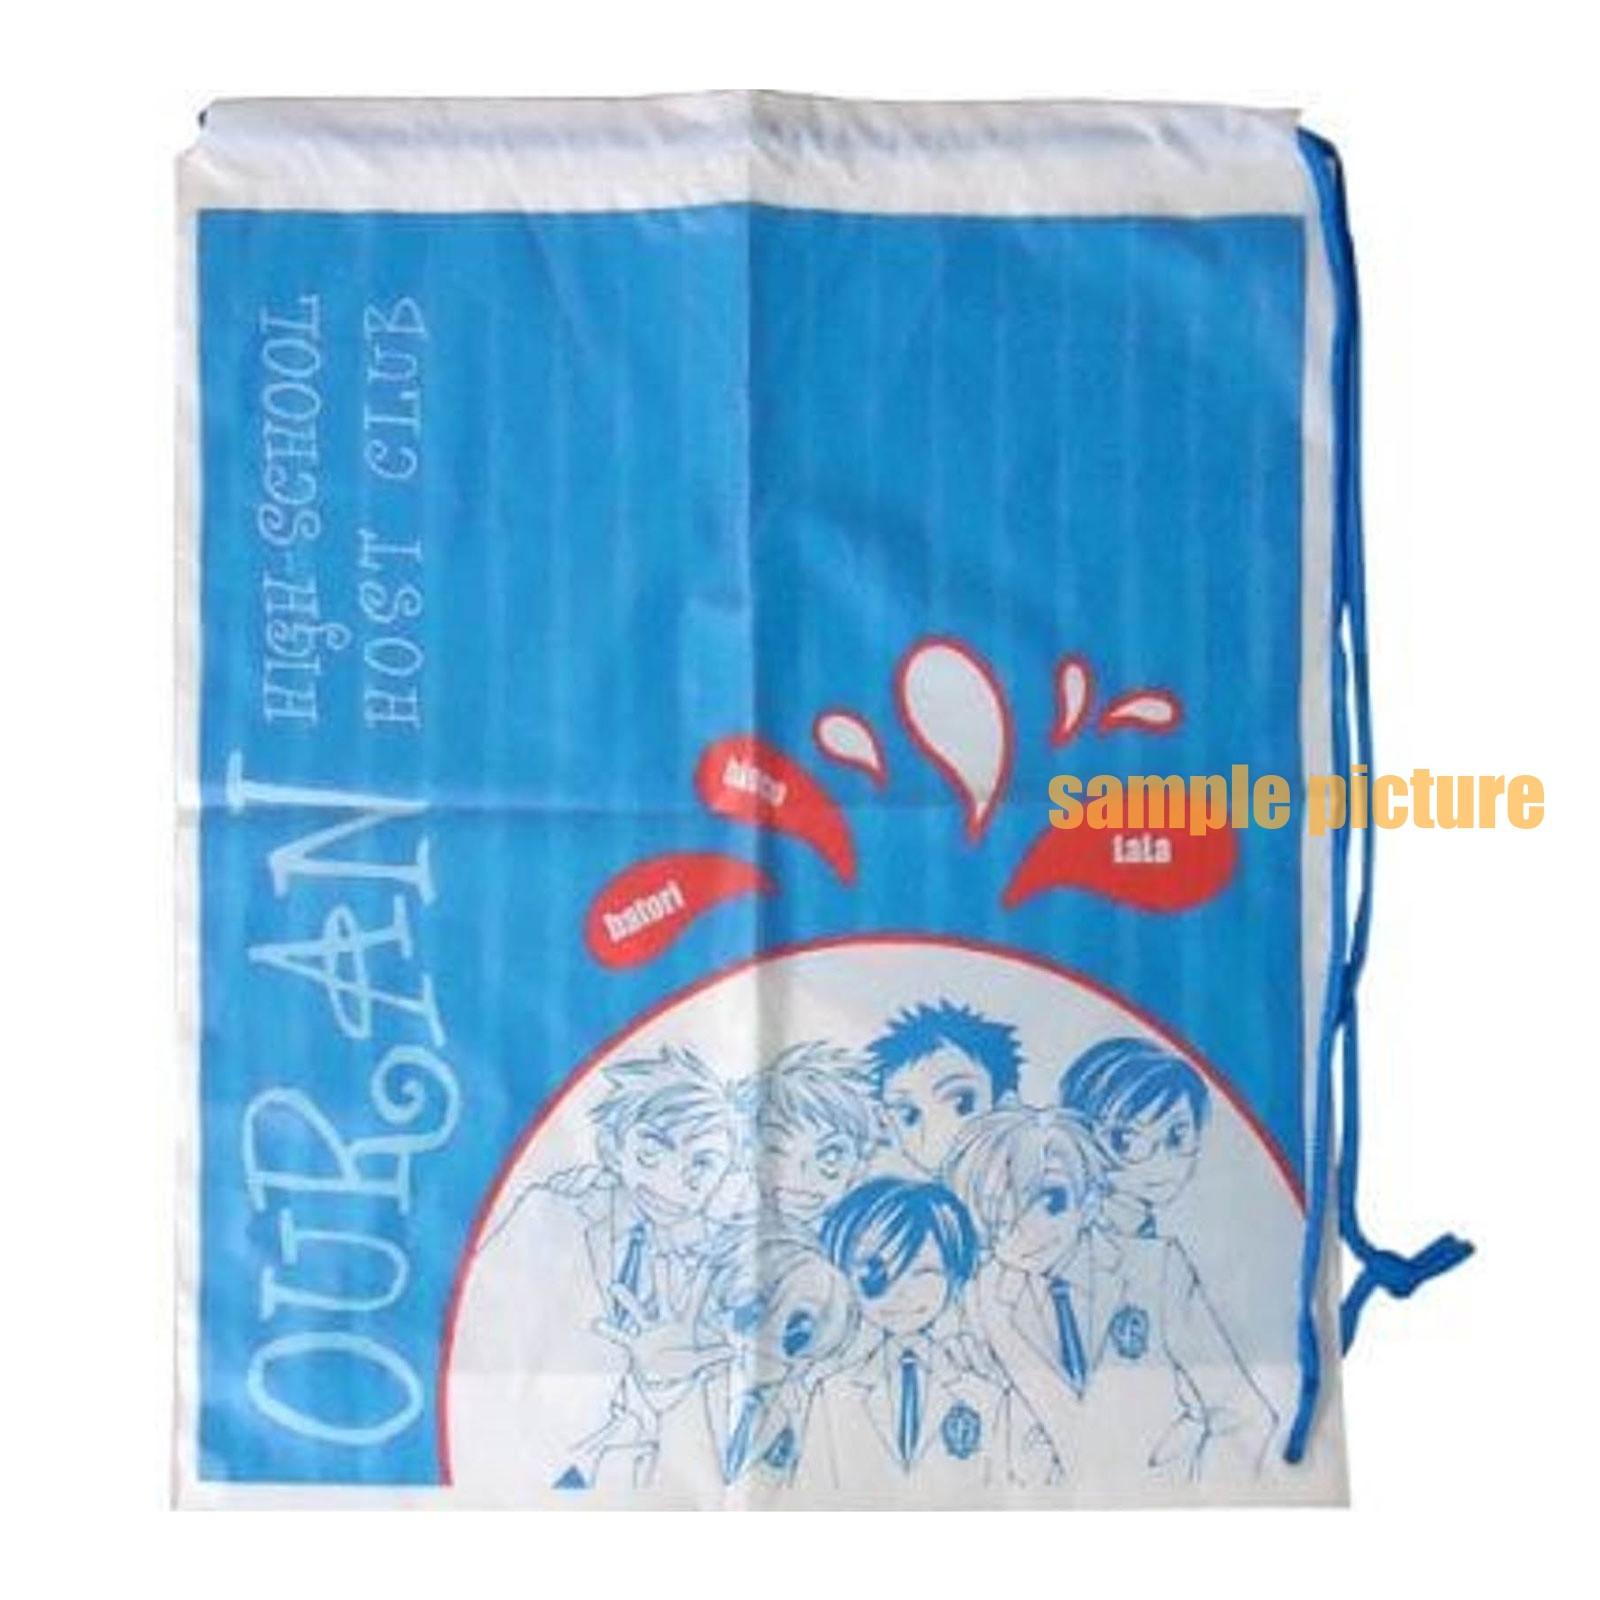 Ouran High School Host Club Vinyl bag JAPAN MANGA